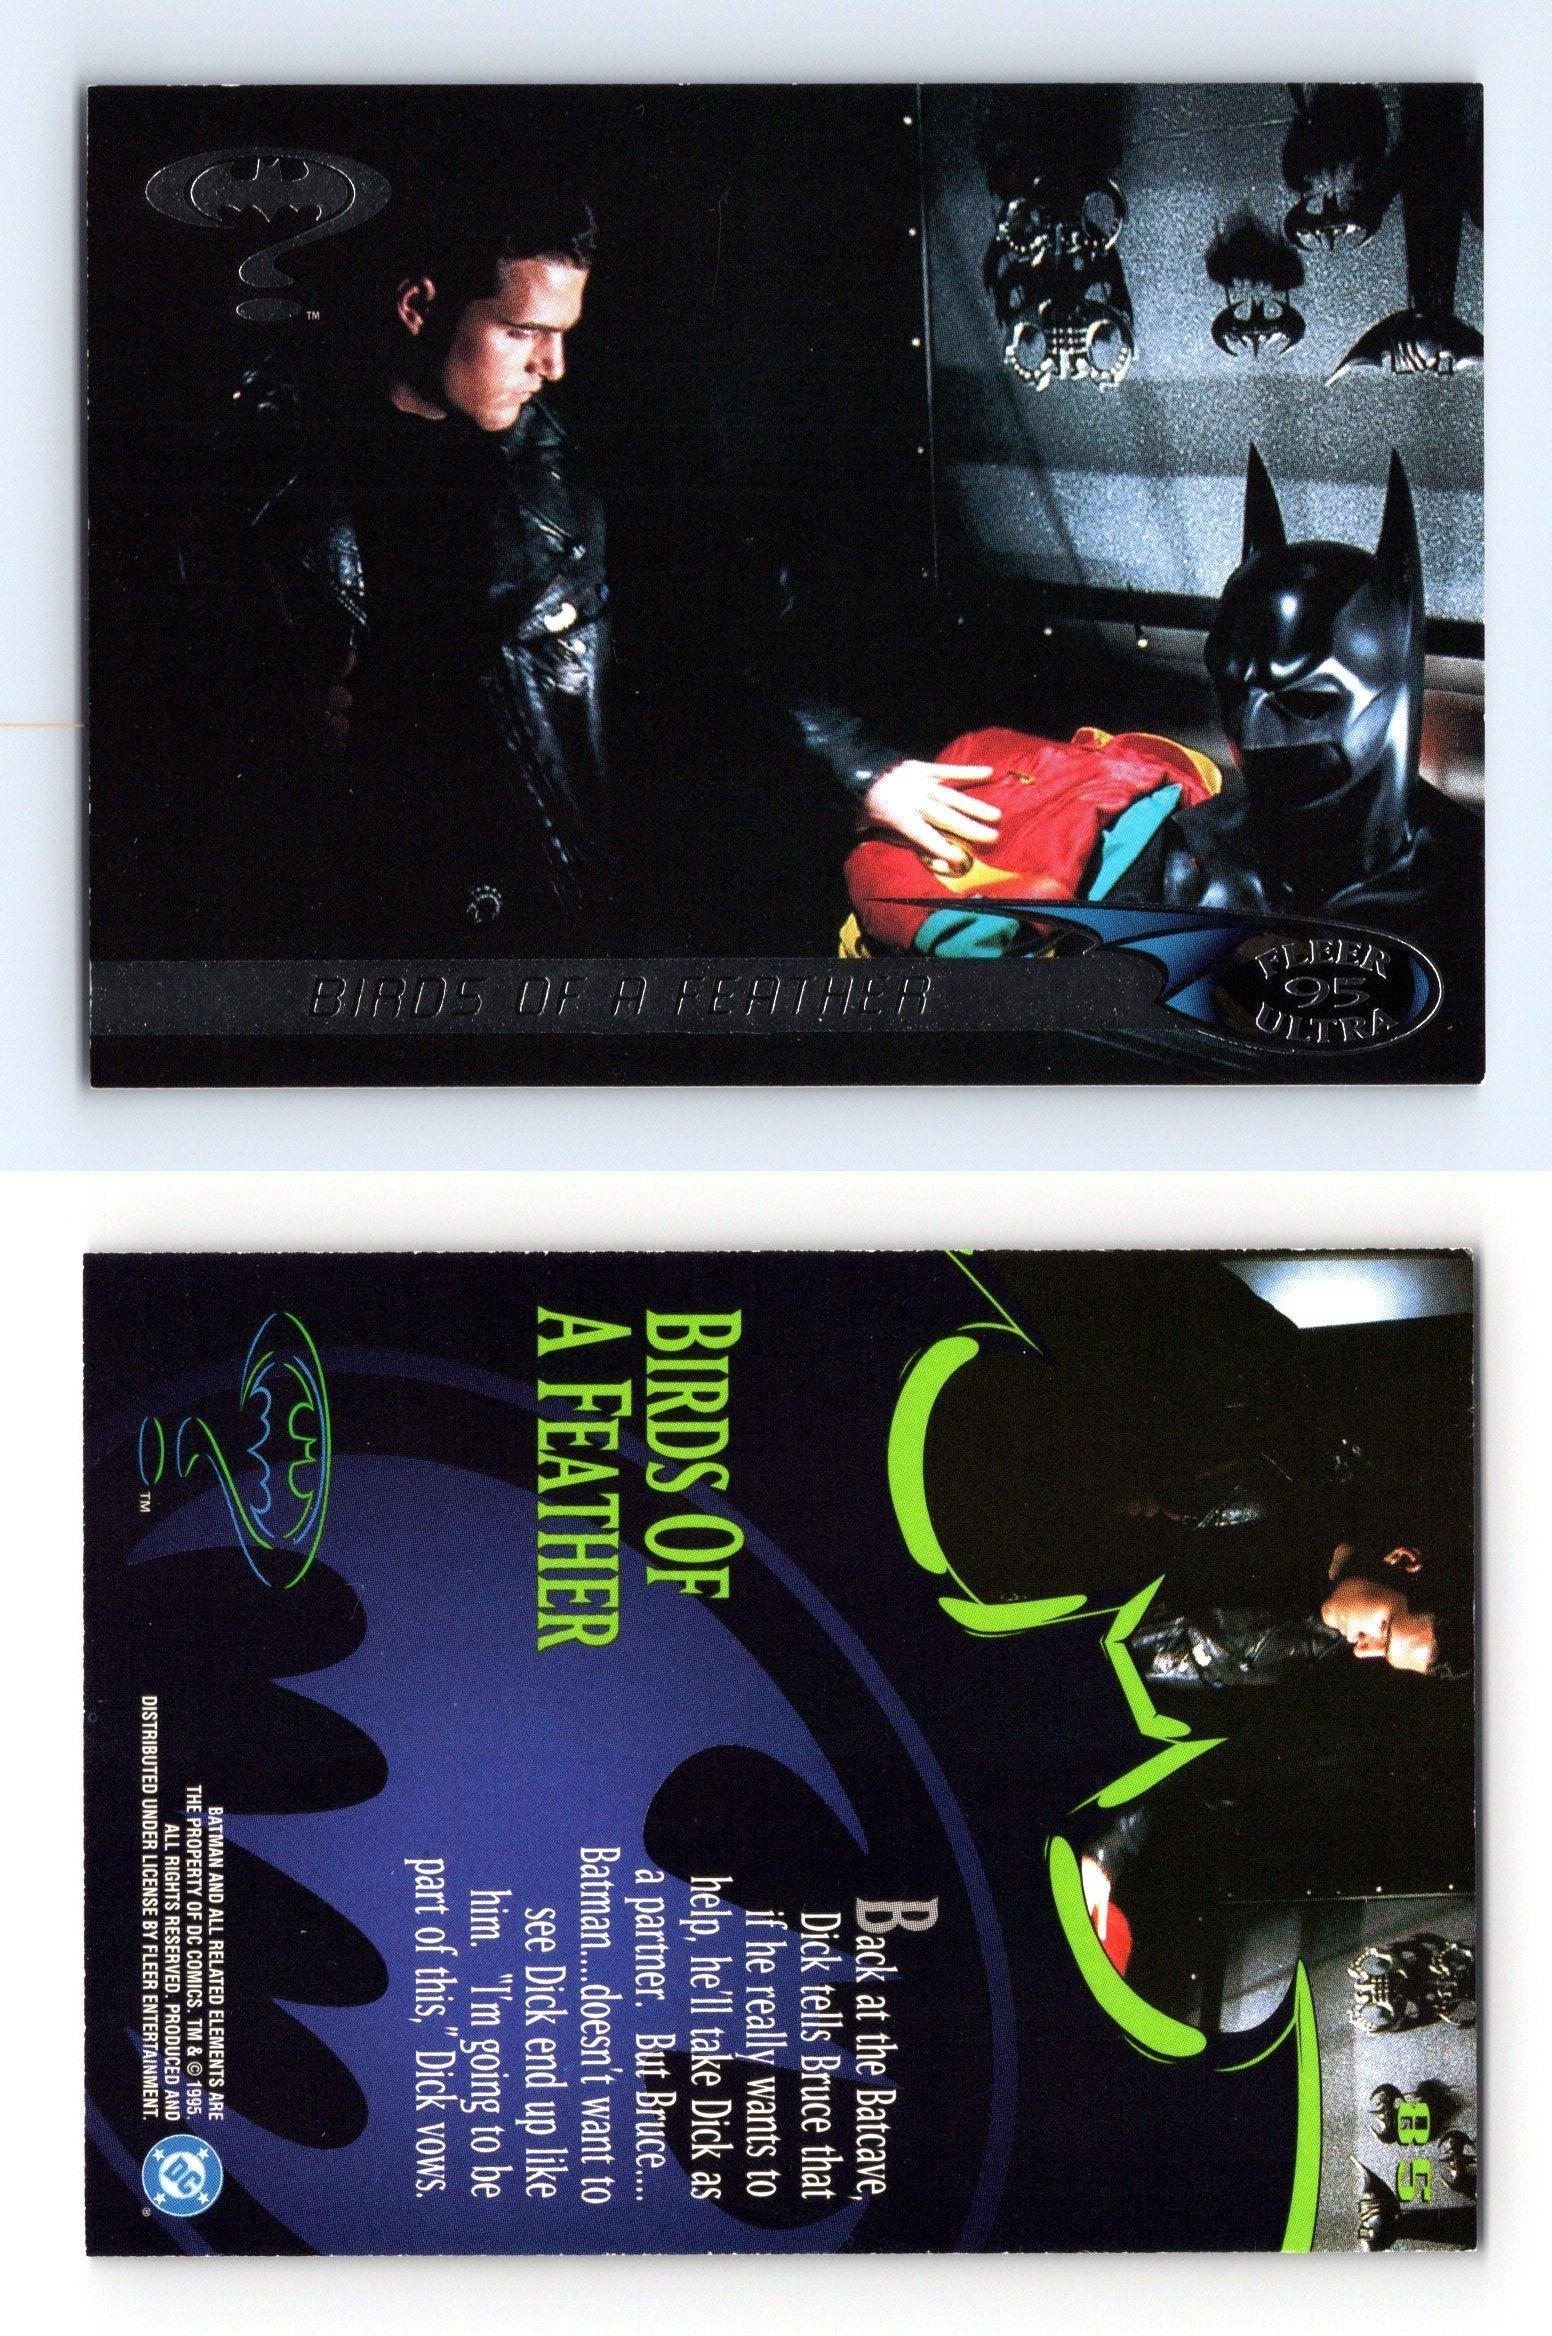 Sweet Temptation #64 Batman Forever 1995 Fleer Ultra Trading Card